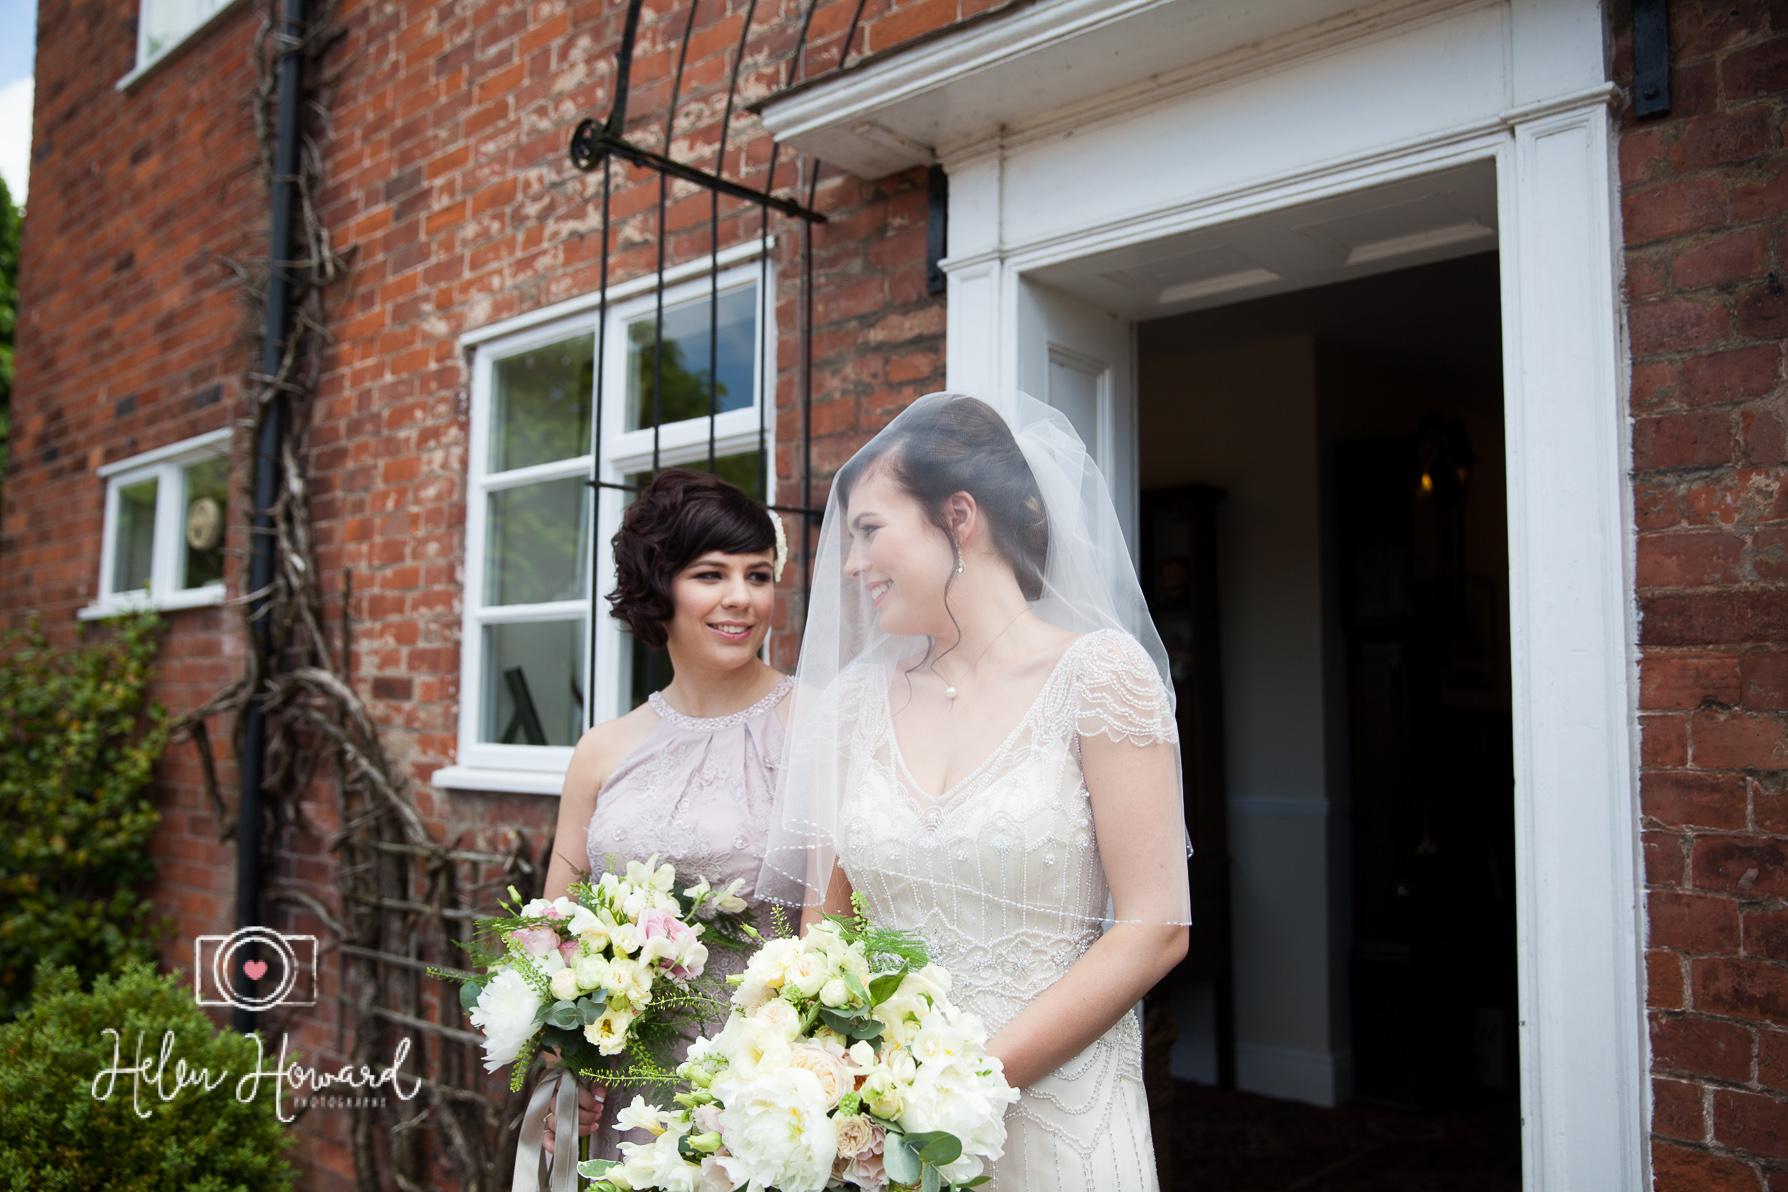 Helen Howard Photography Packington Moor Wedding-58.jpg